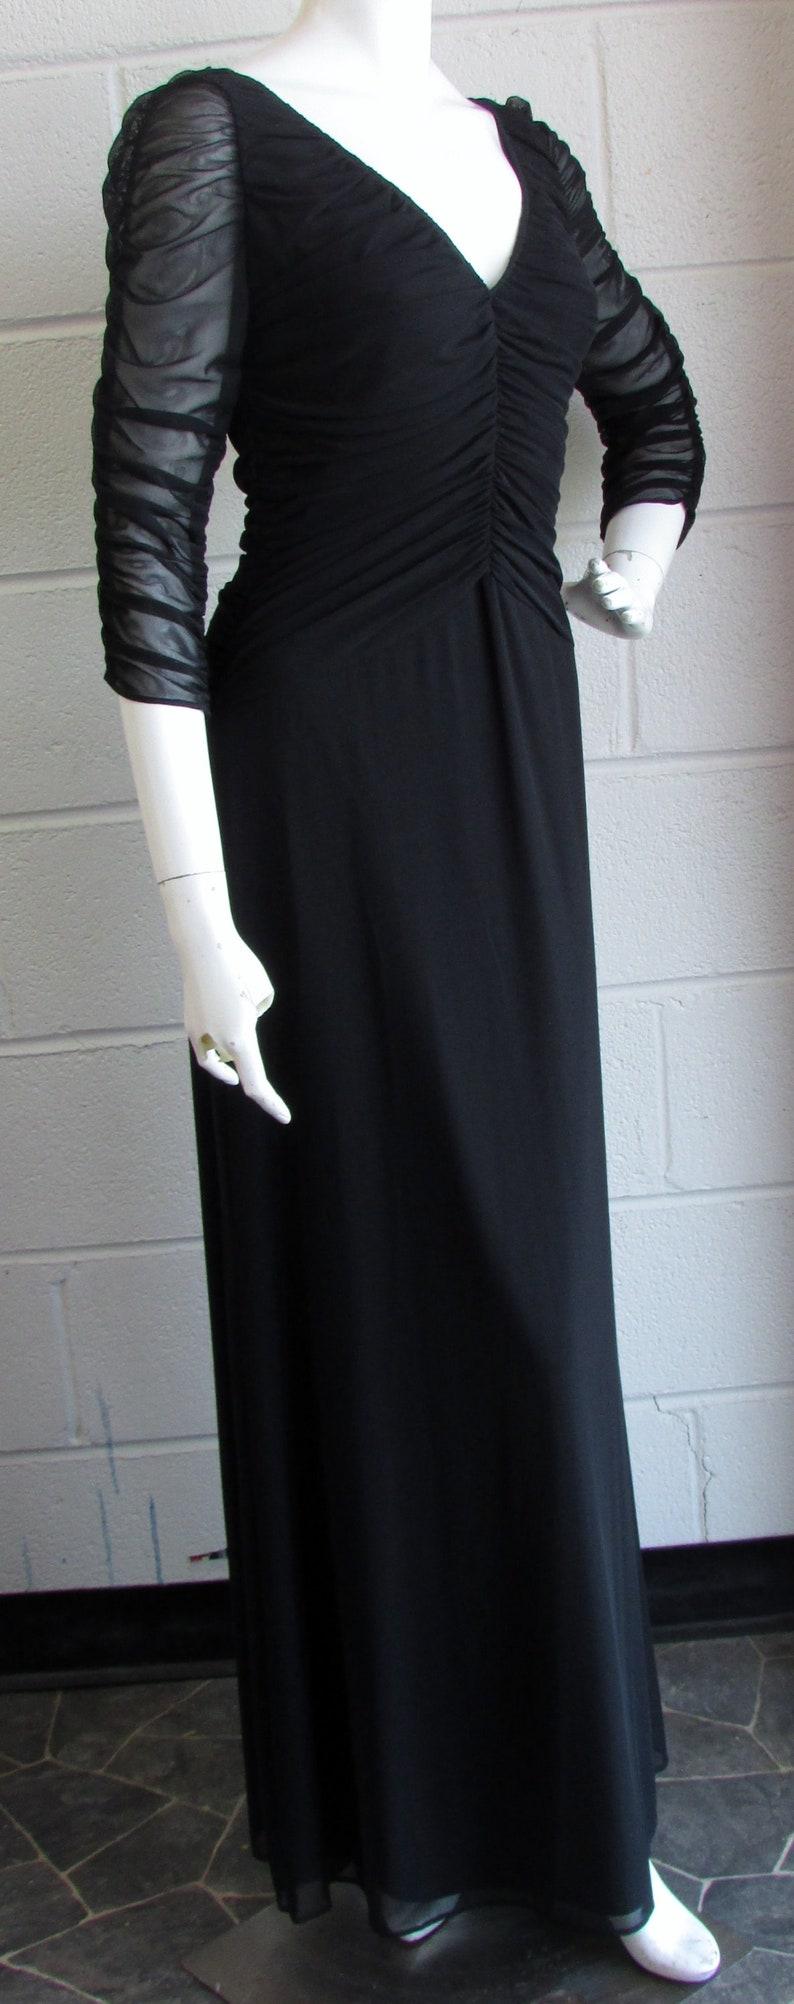 Collarless V-Neck Sheer Long Sleeves Full Length Size SM Made in USA Black Handmade Gown Vintage 90/'s